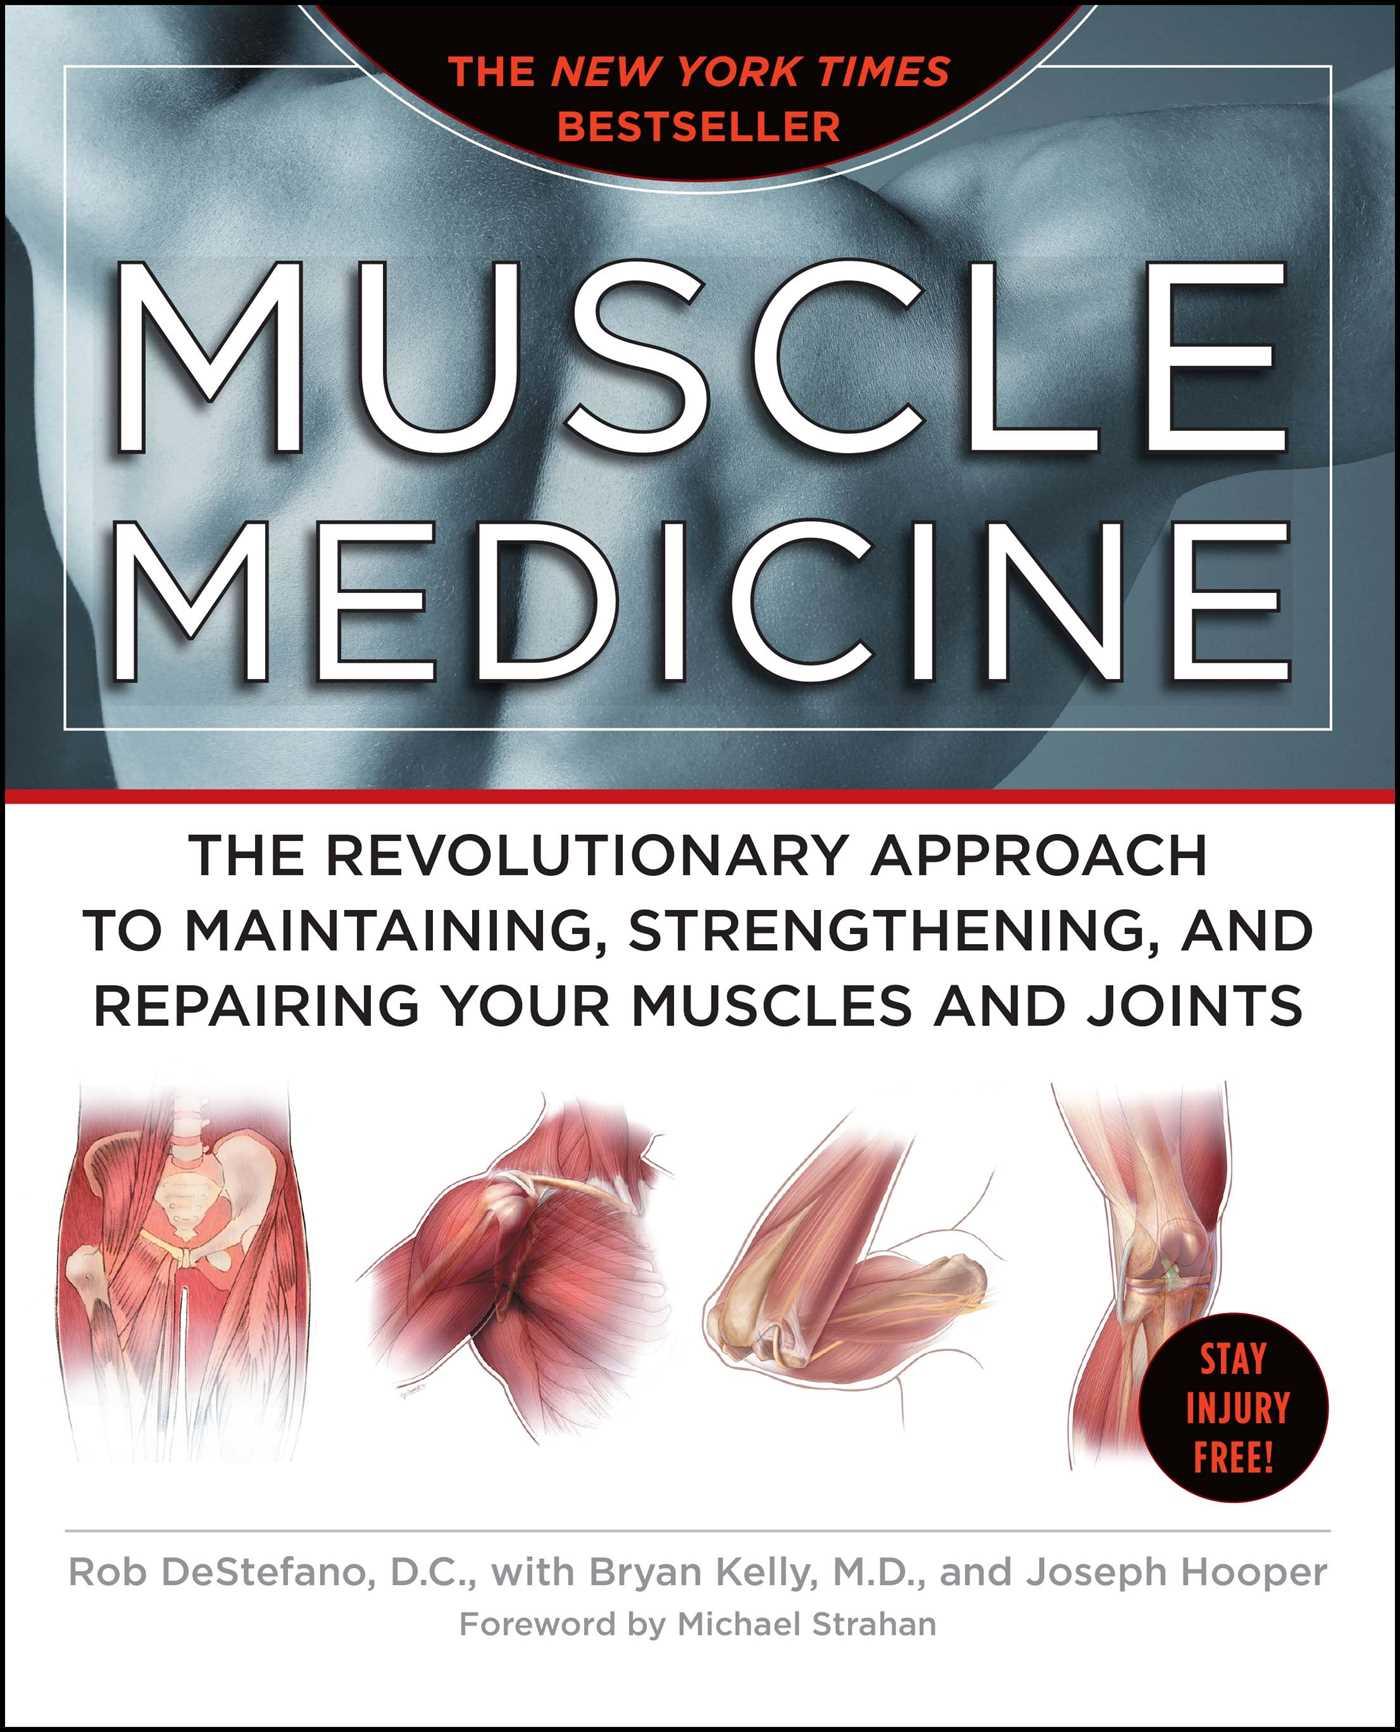 Muscle medicine 9781416562566 hr